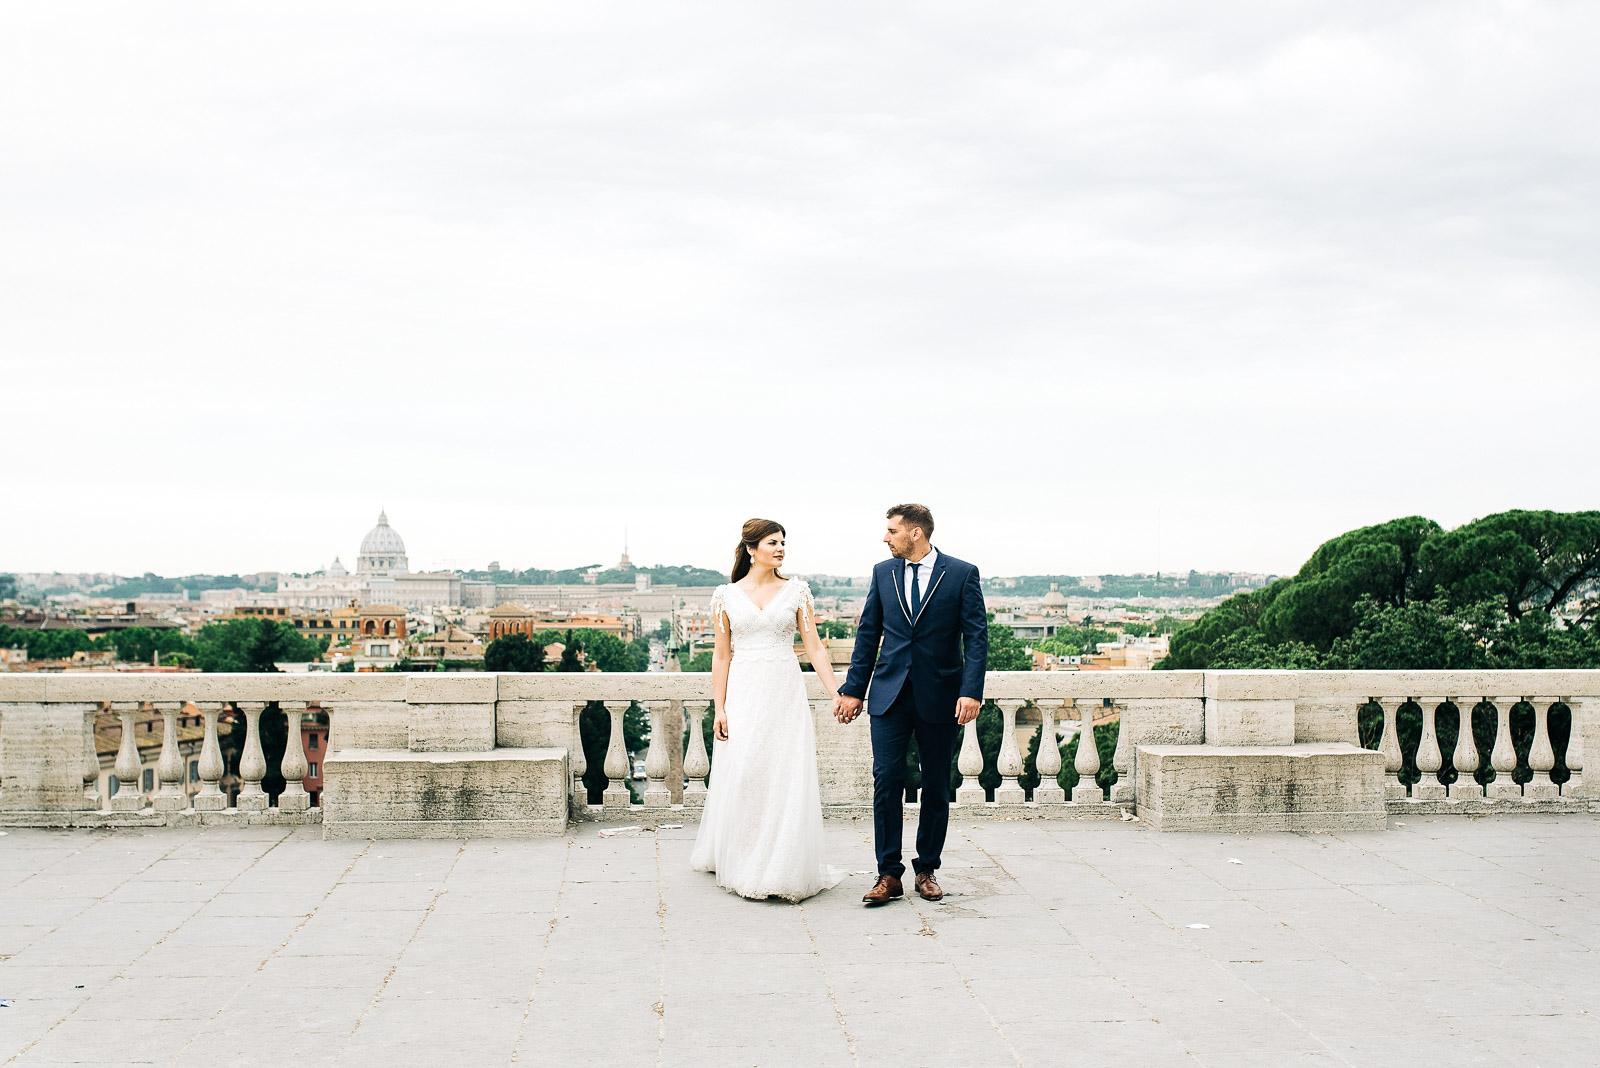 amalfy wedding photographer